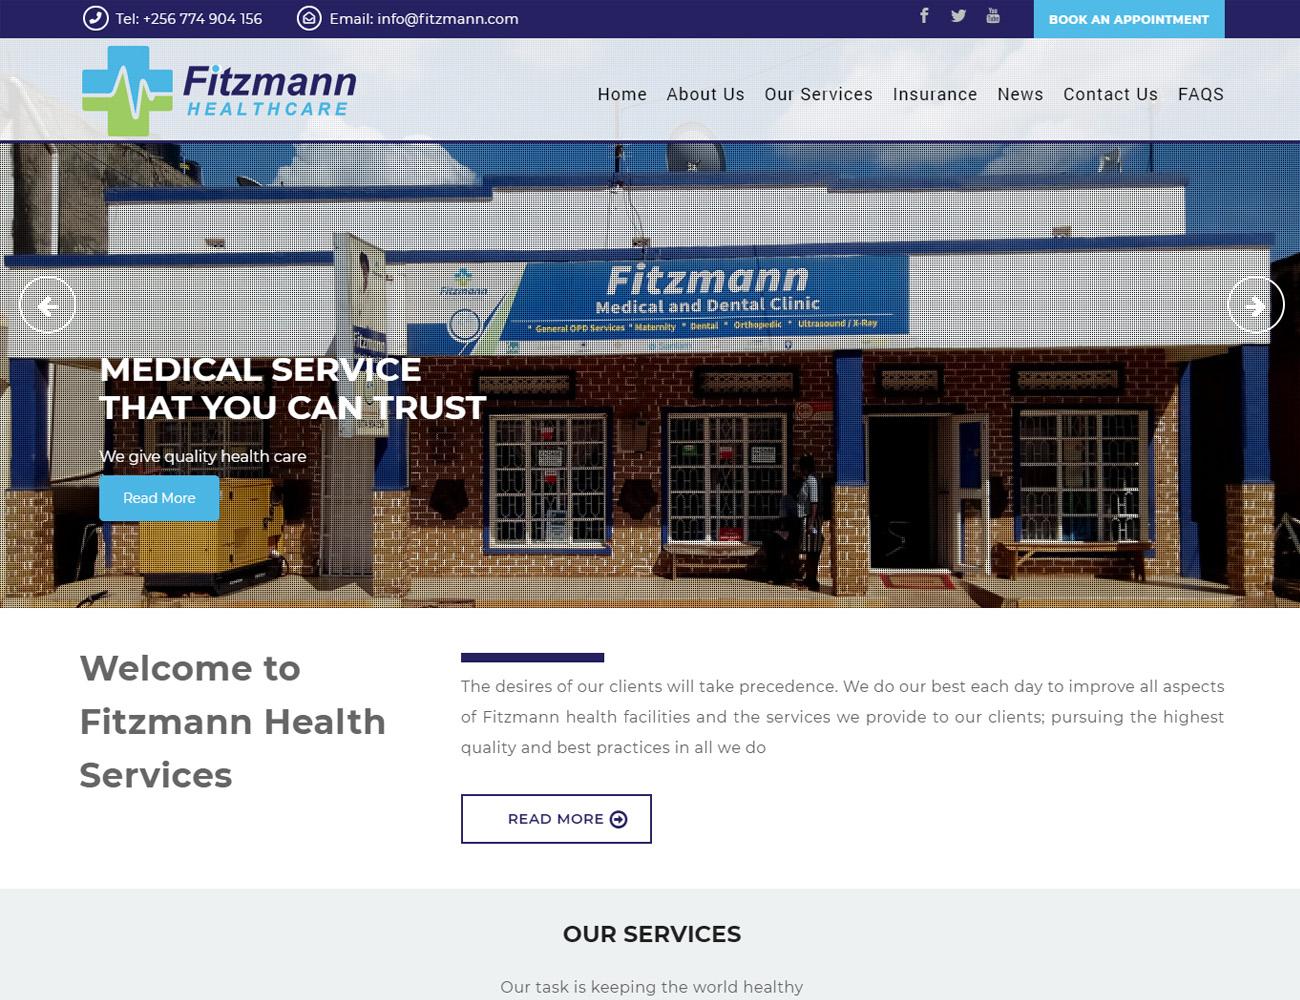 Fitzmann Website Designed by HostGiant